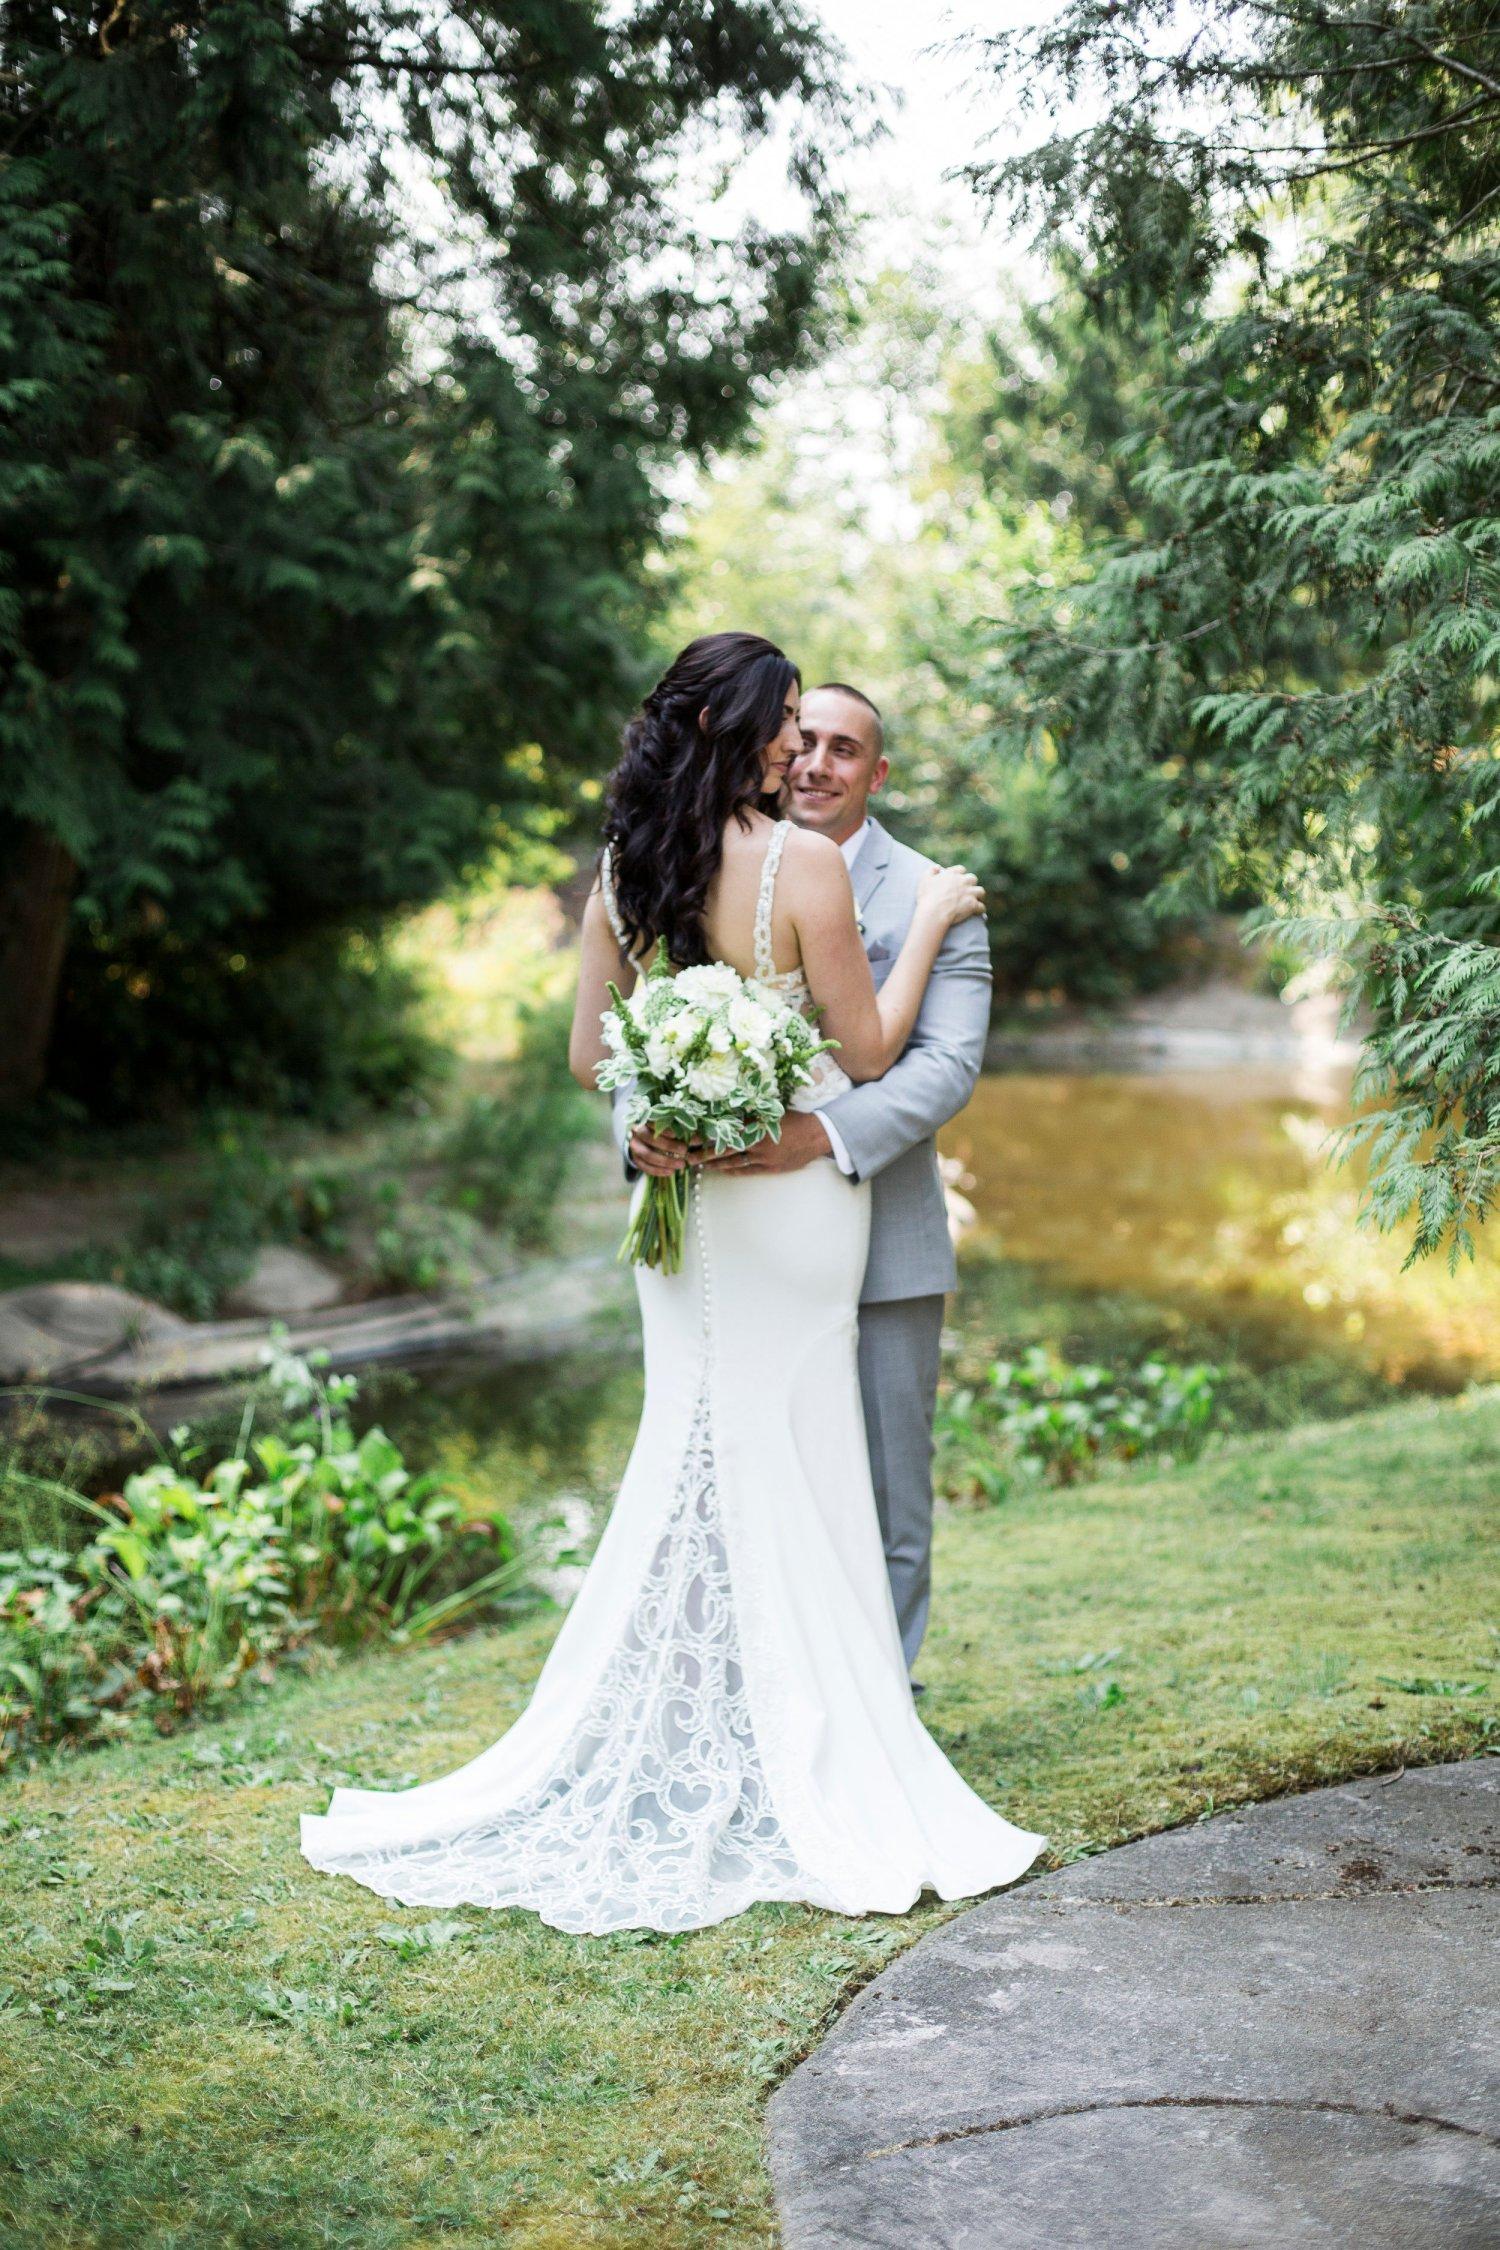 Seattle-Tacoma-Wedding-Photographer-Jaeda-Reed-BC015.jpg